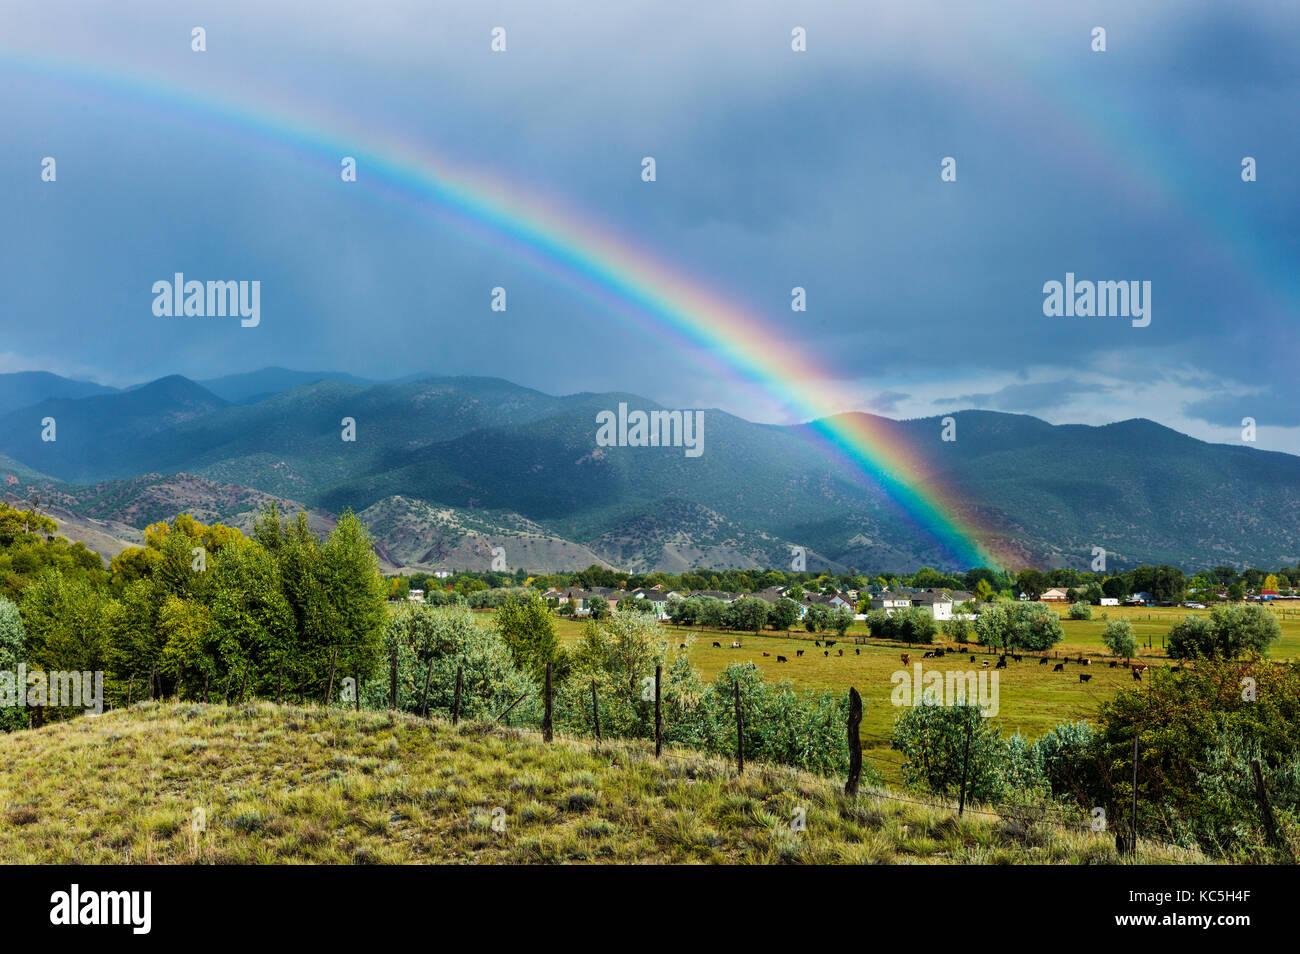 Rainbow over the small mountain town of Salida, Colorado, USA Stock Photo